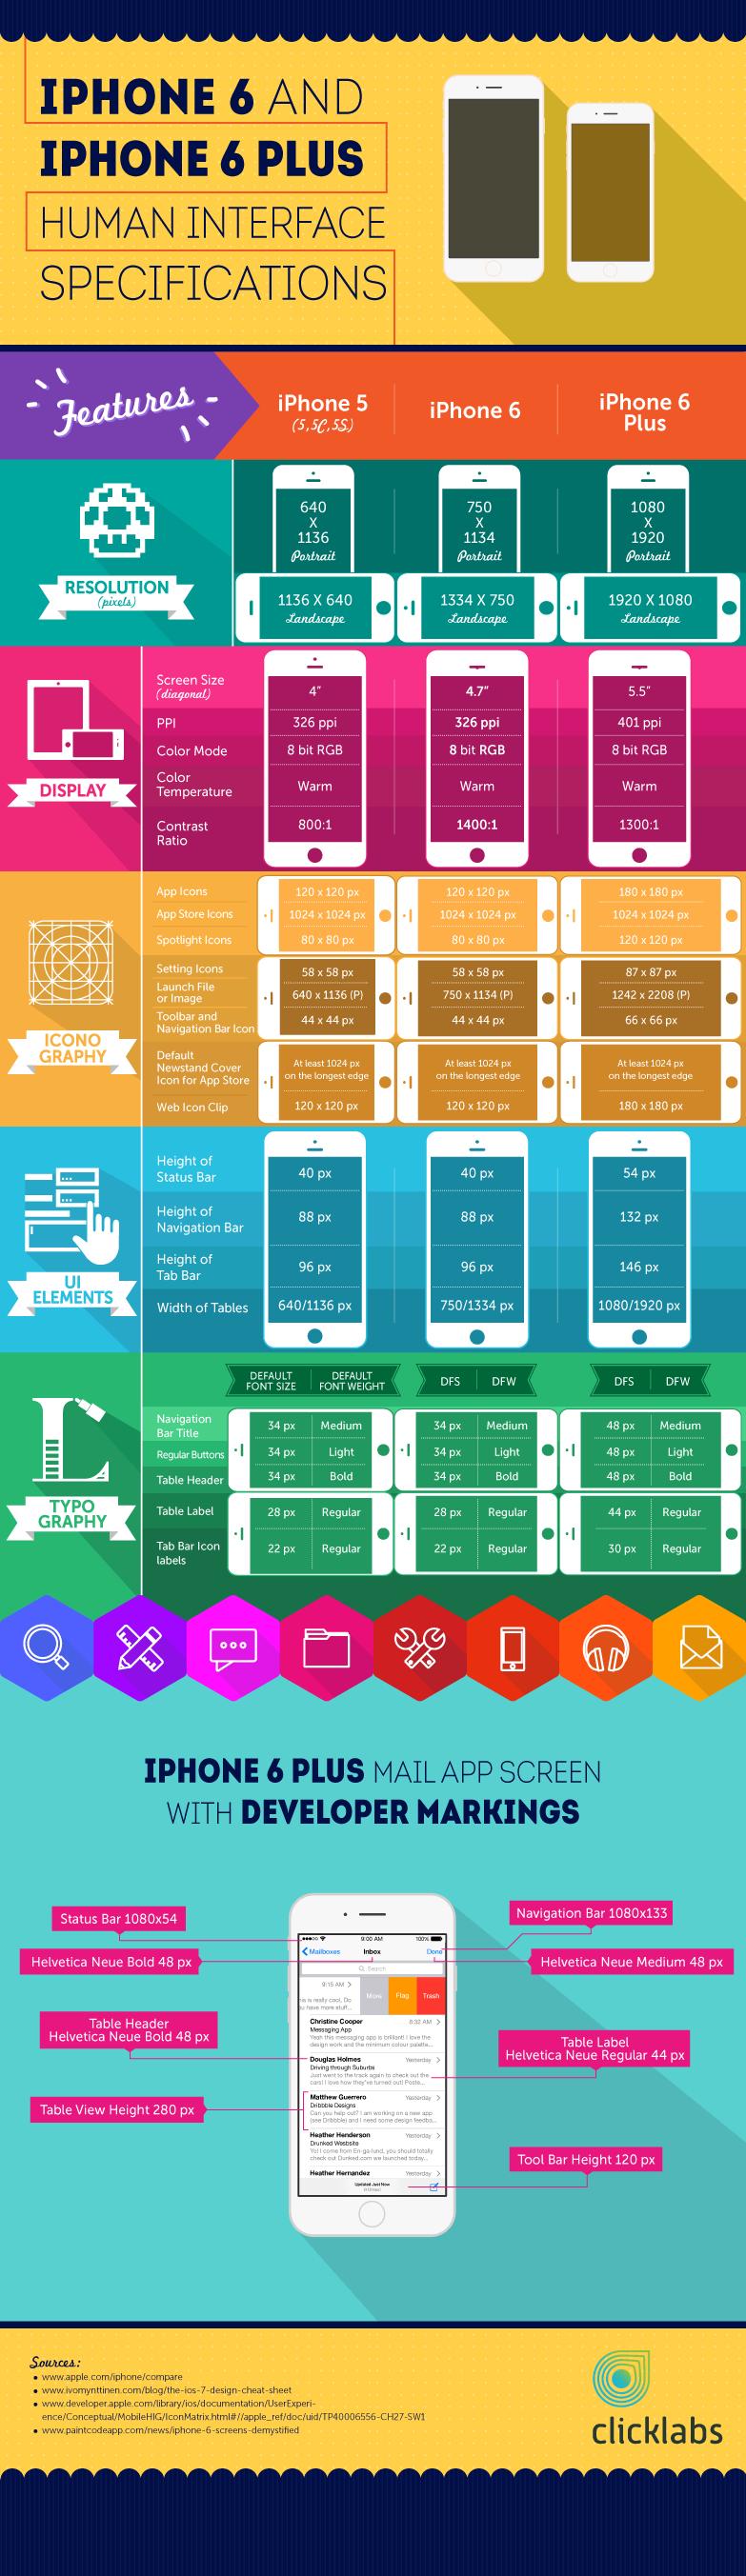 Design Cheat Sheet   Ios design, Infographic, Interactive design